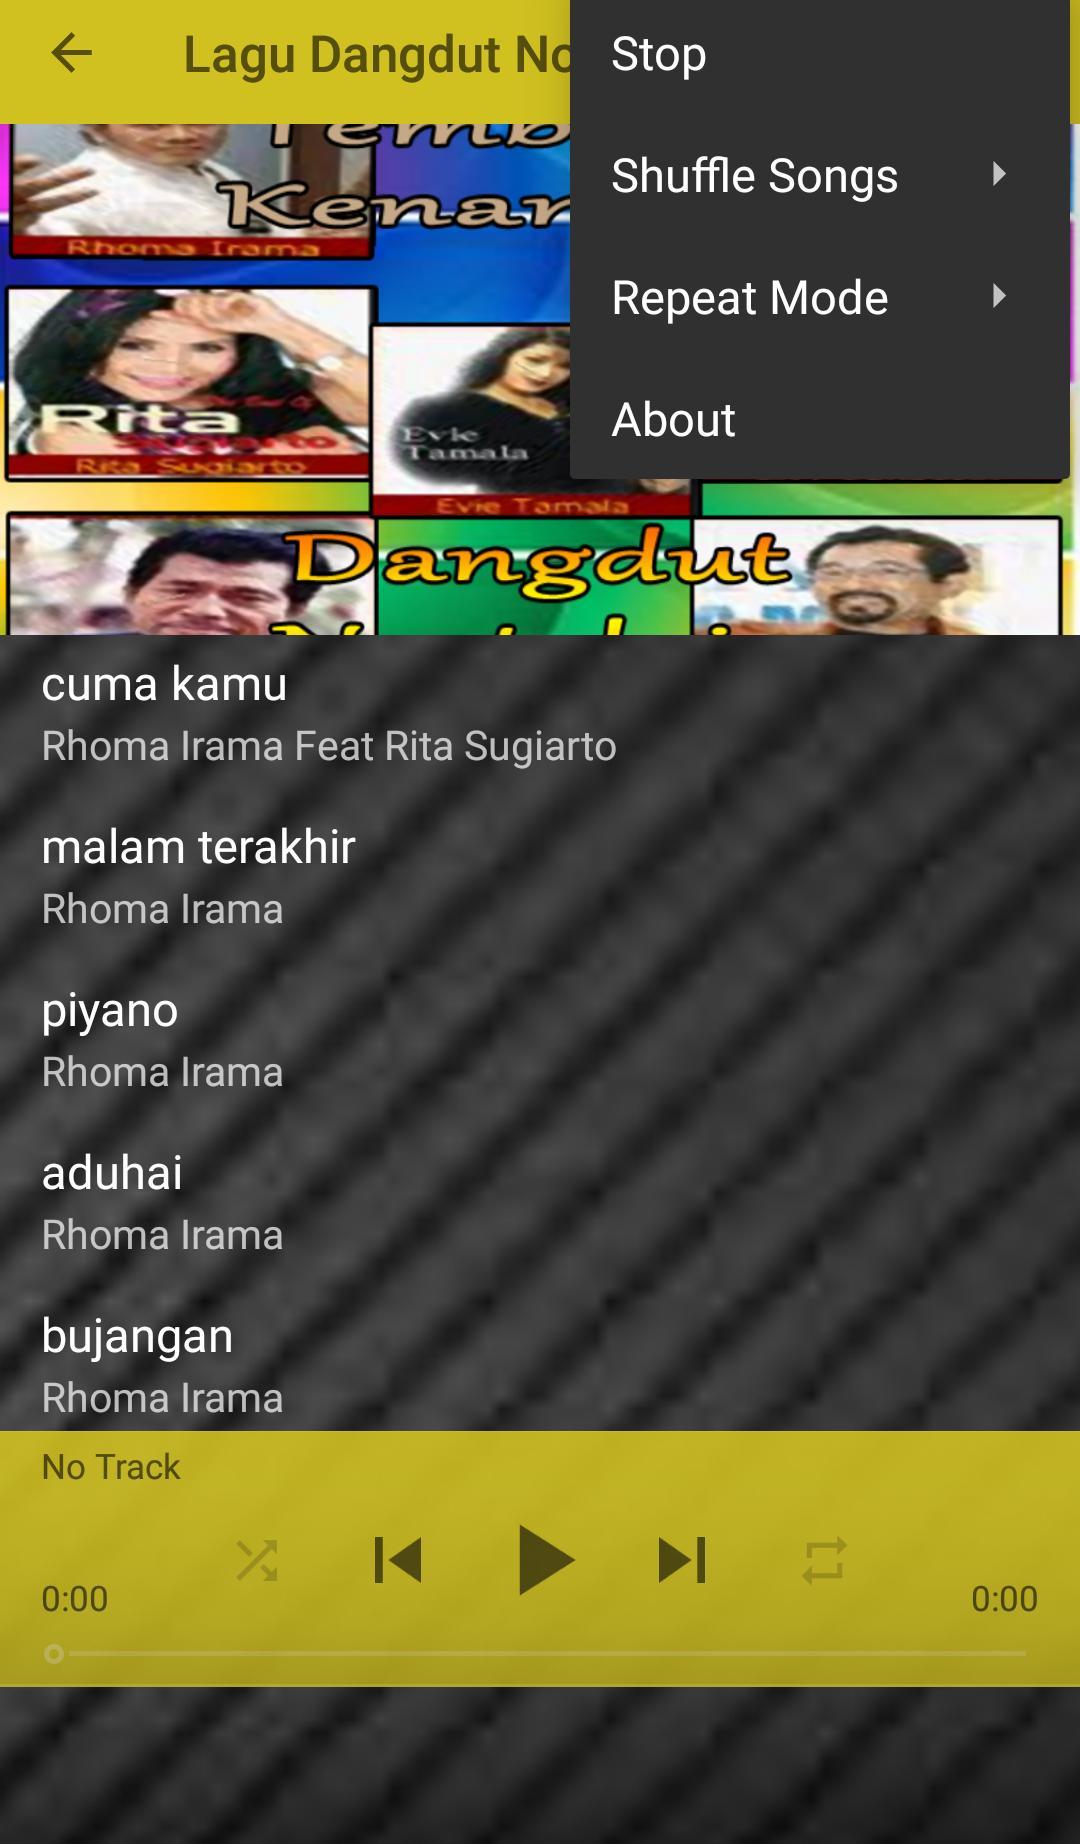 Mp3 Lagu Dangdut Lawas Offline for Android - APK Download